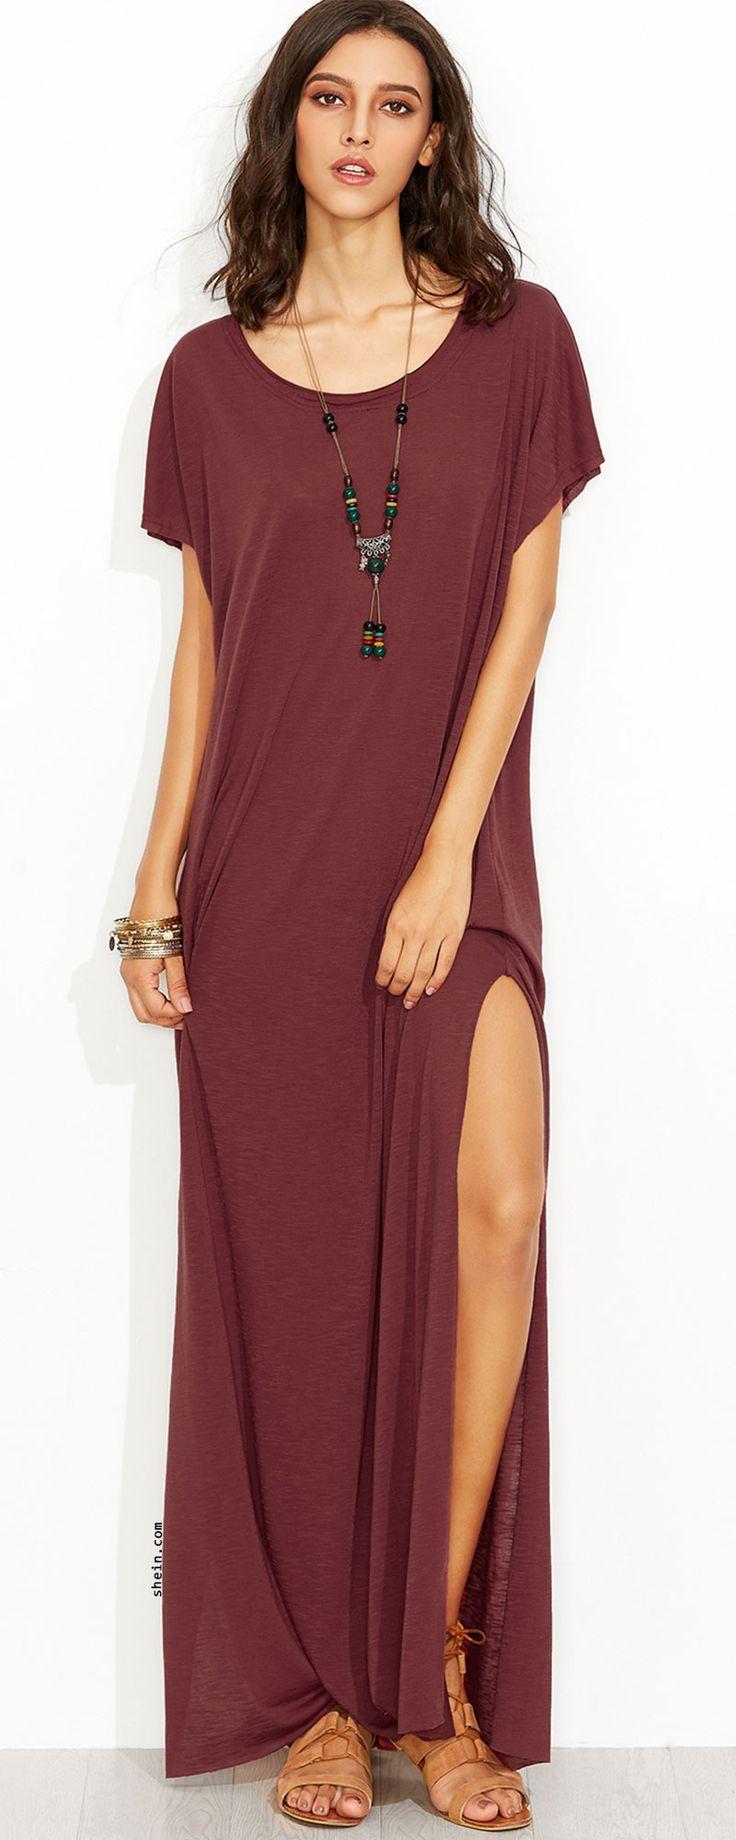 Burgundy Side Slit Loose Fit Maxi Tee Dress